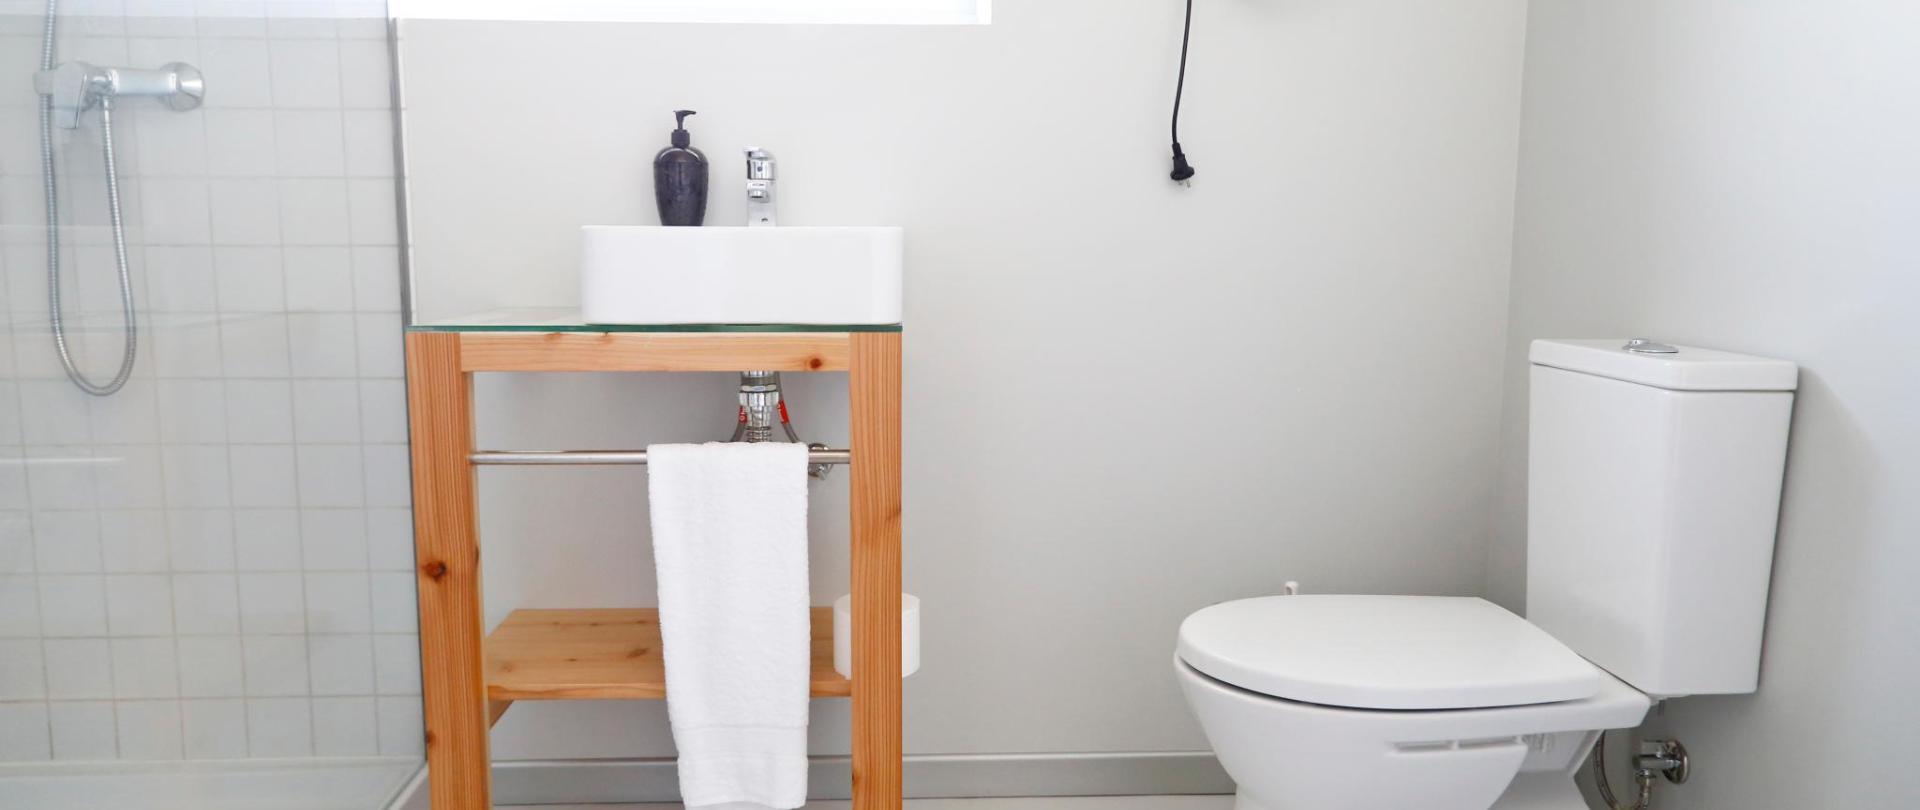 Private bathrooom on deluxe private room- City's Hostel Ponta Delgada (3) .jpg